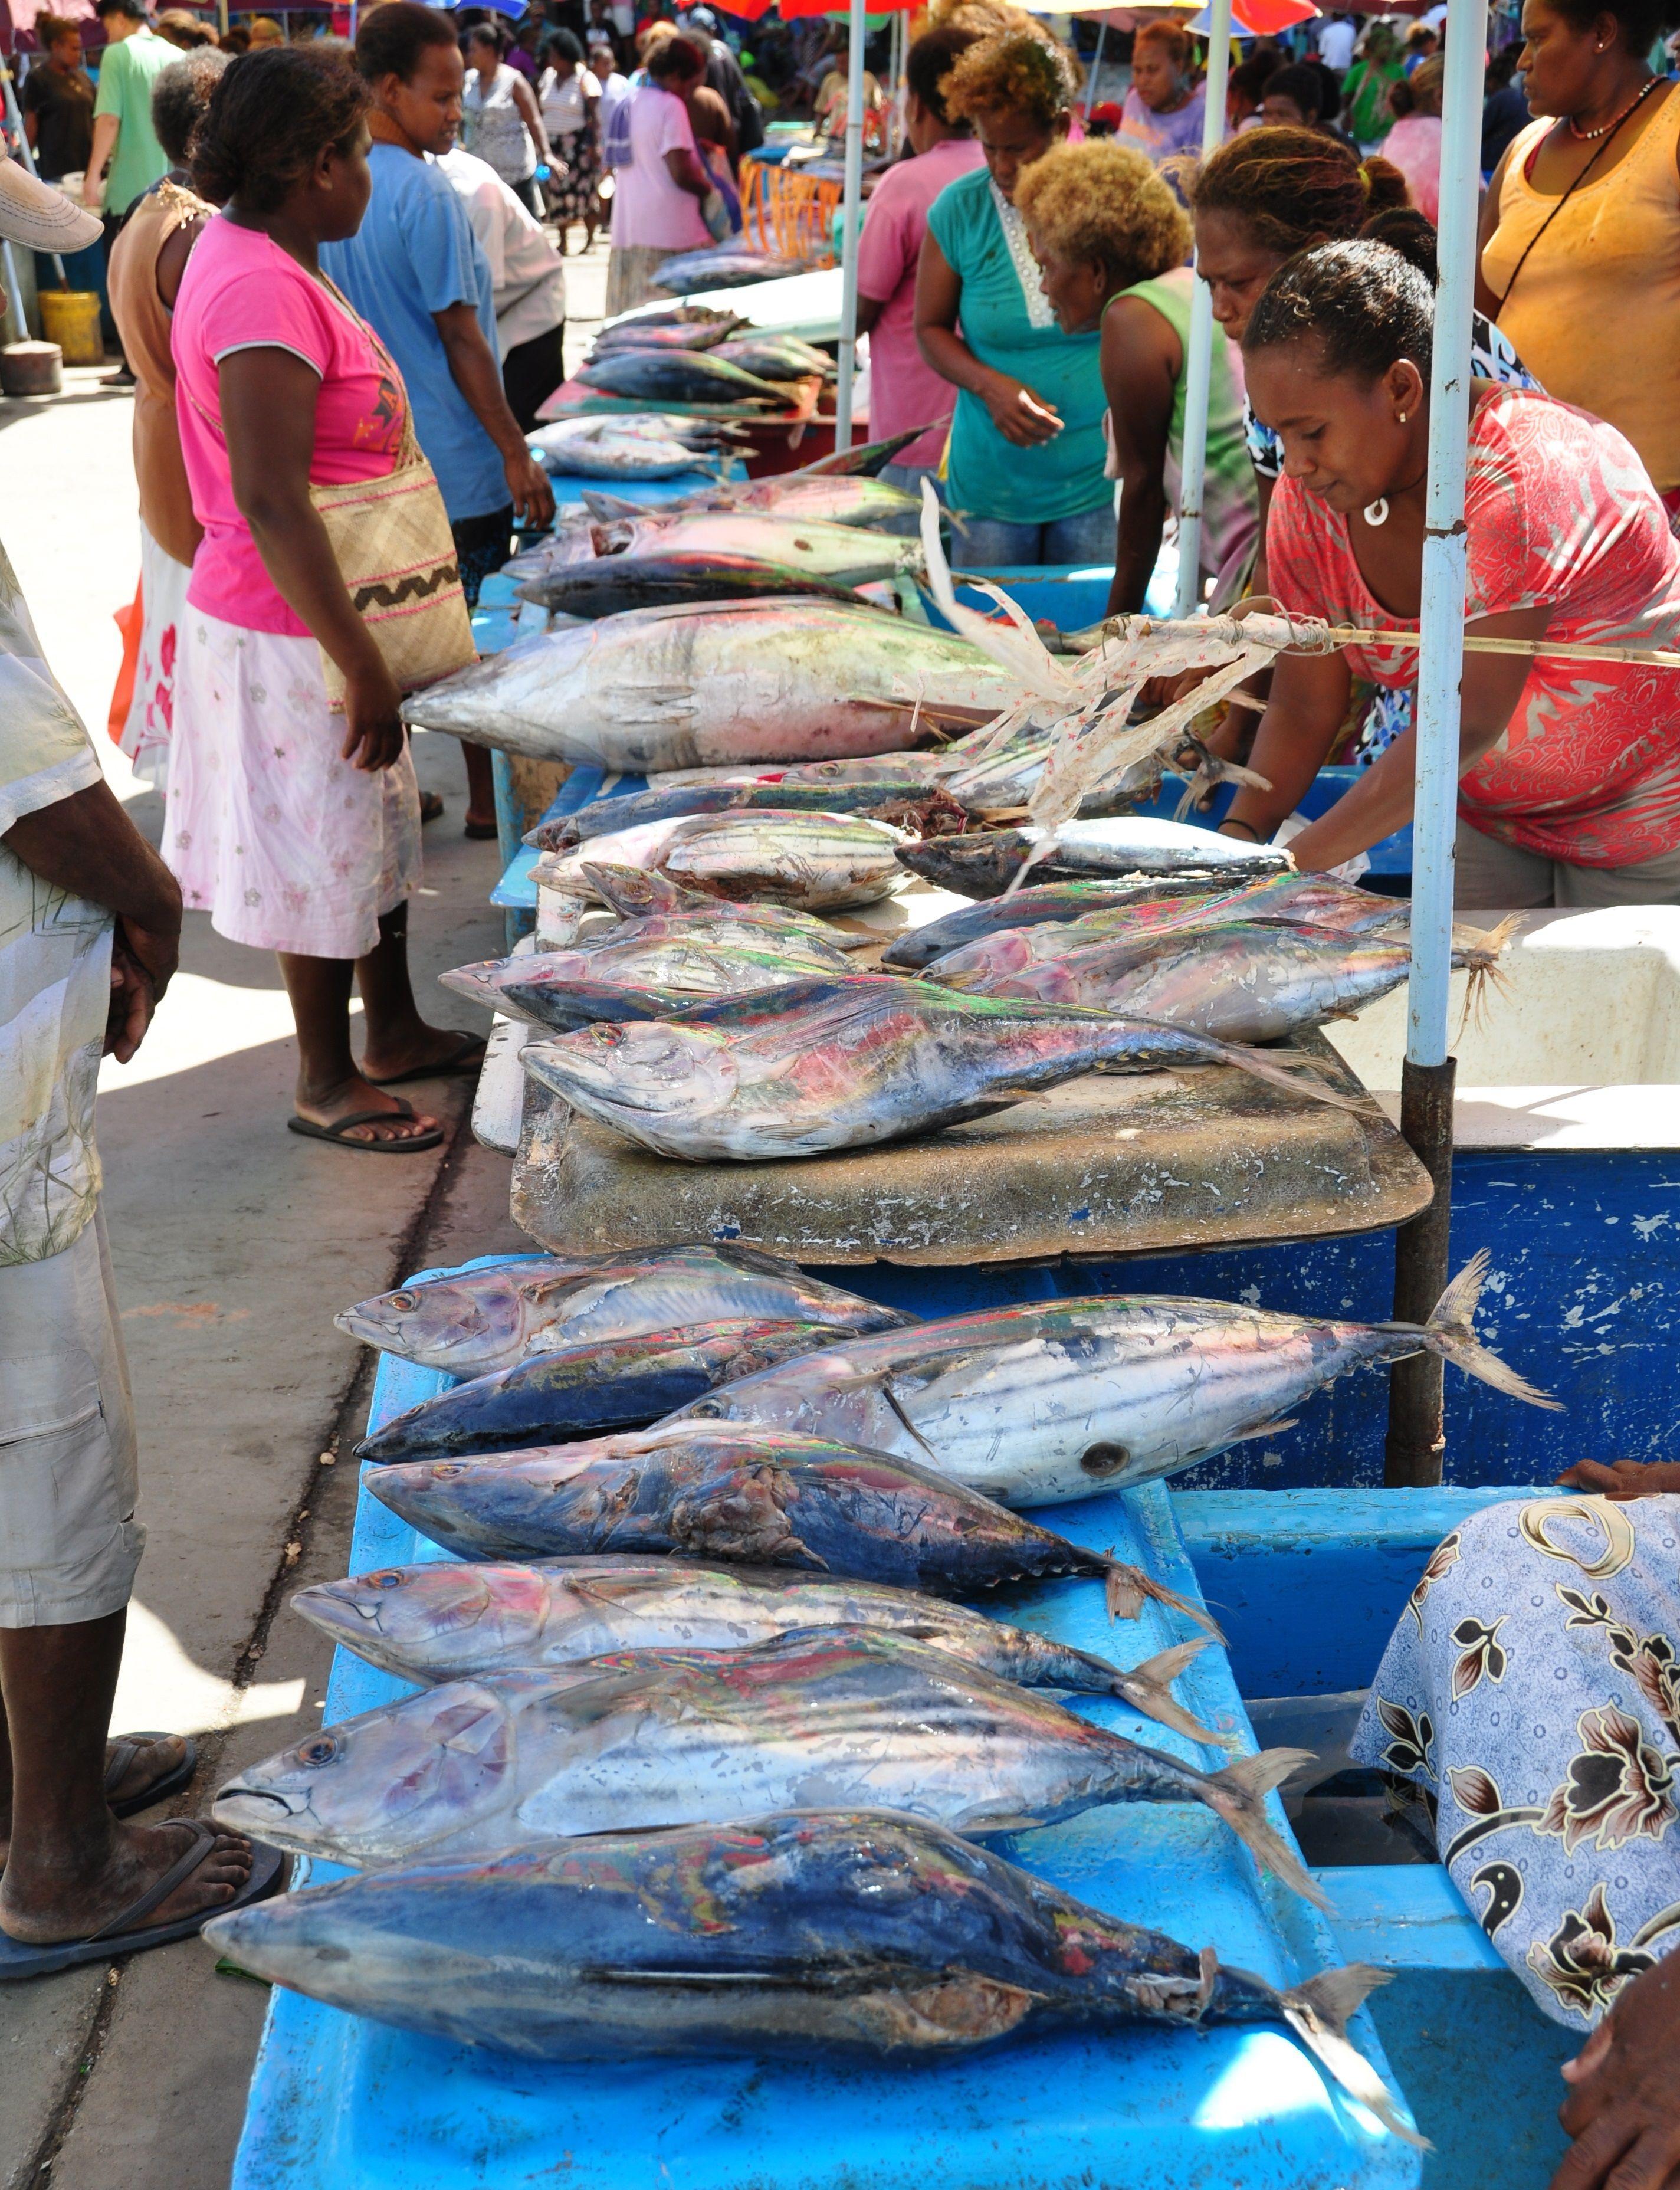 Tuna for sale at seafood market in Honiara, Solomon Islands